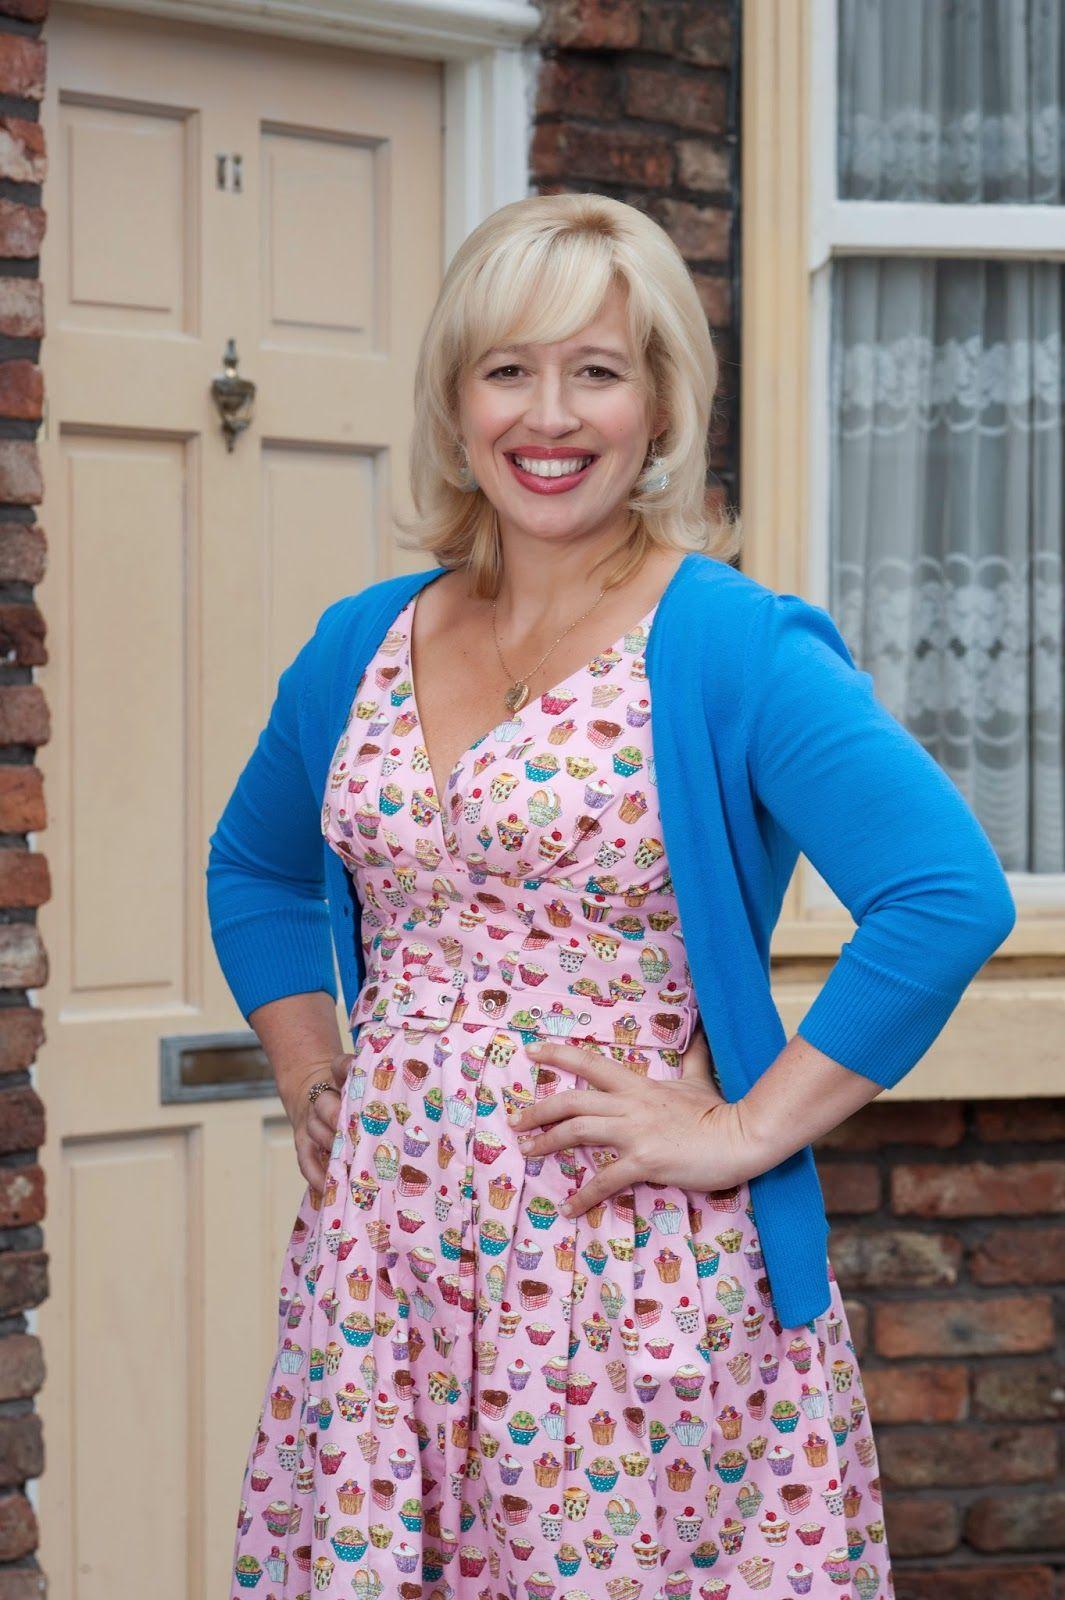 Coronation Street Blog: Katy Cavanagh quits Corrie as Julie Carp